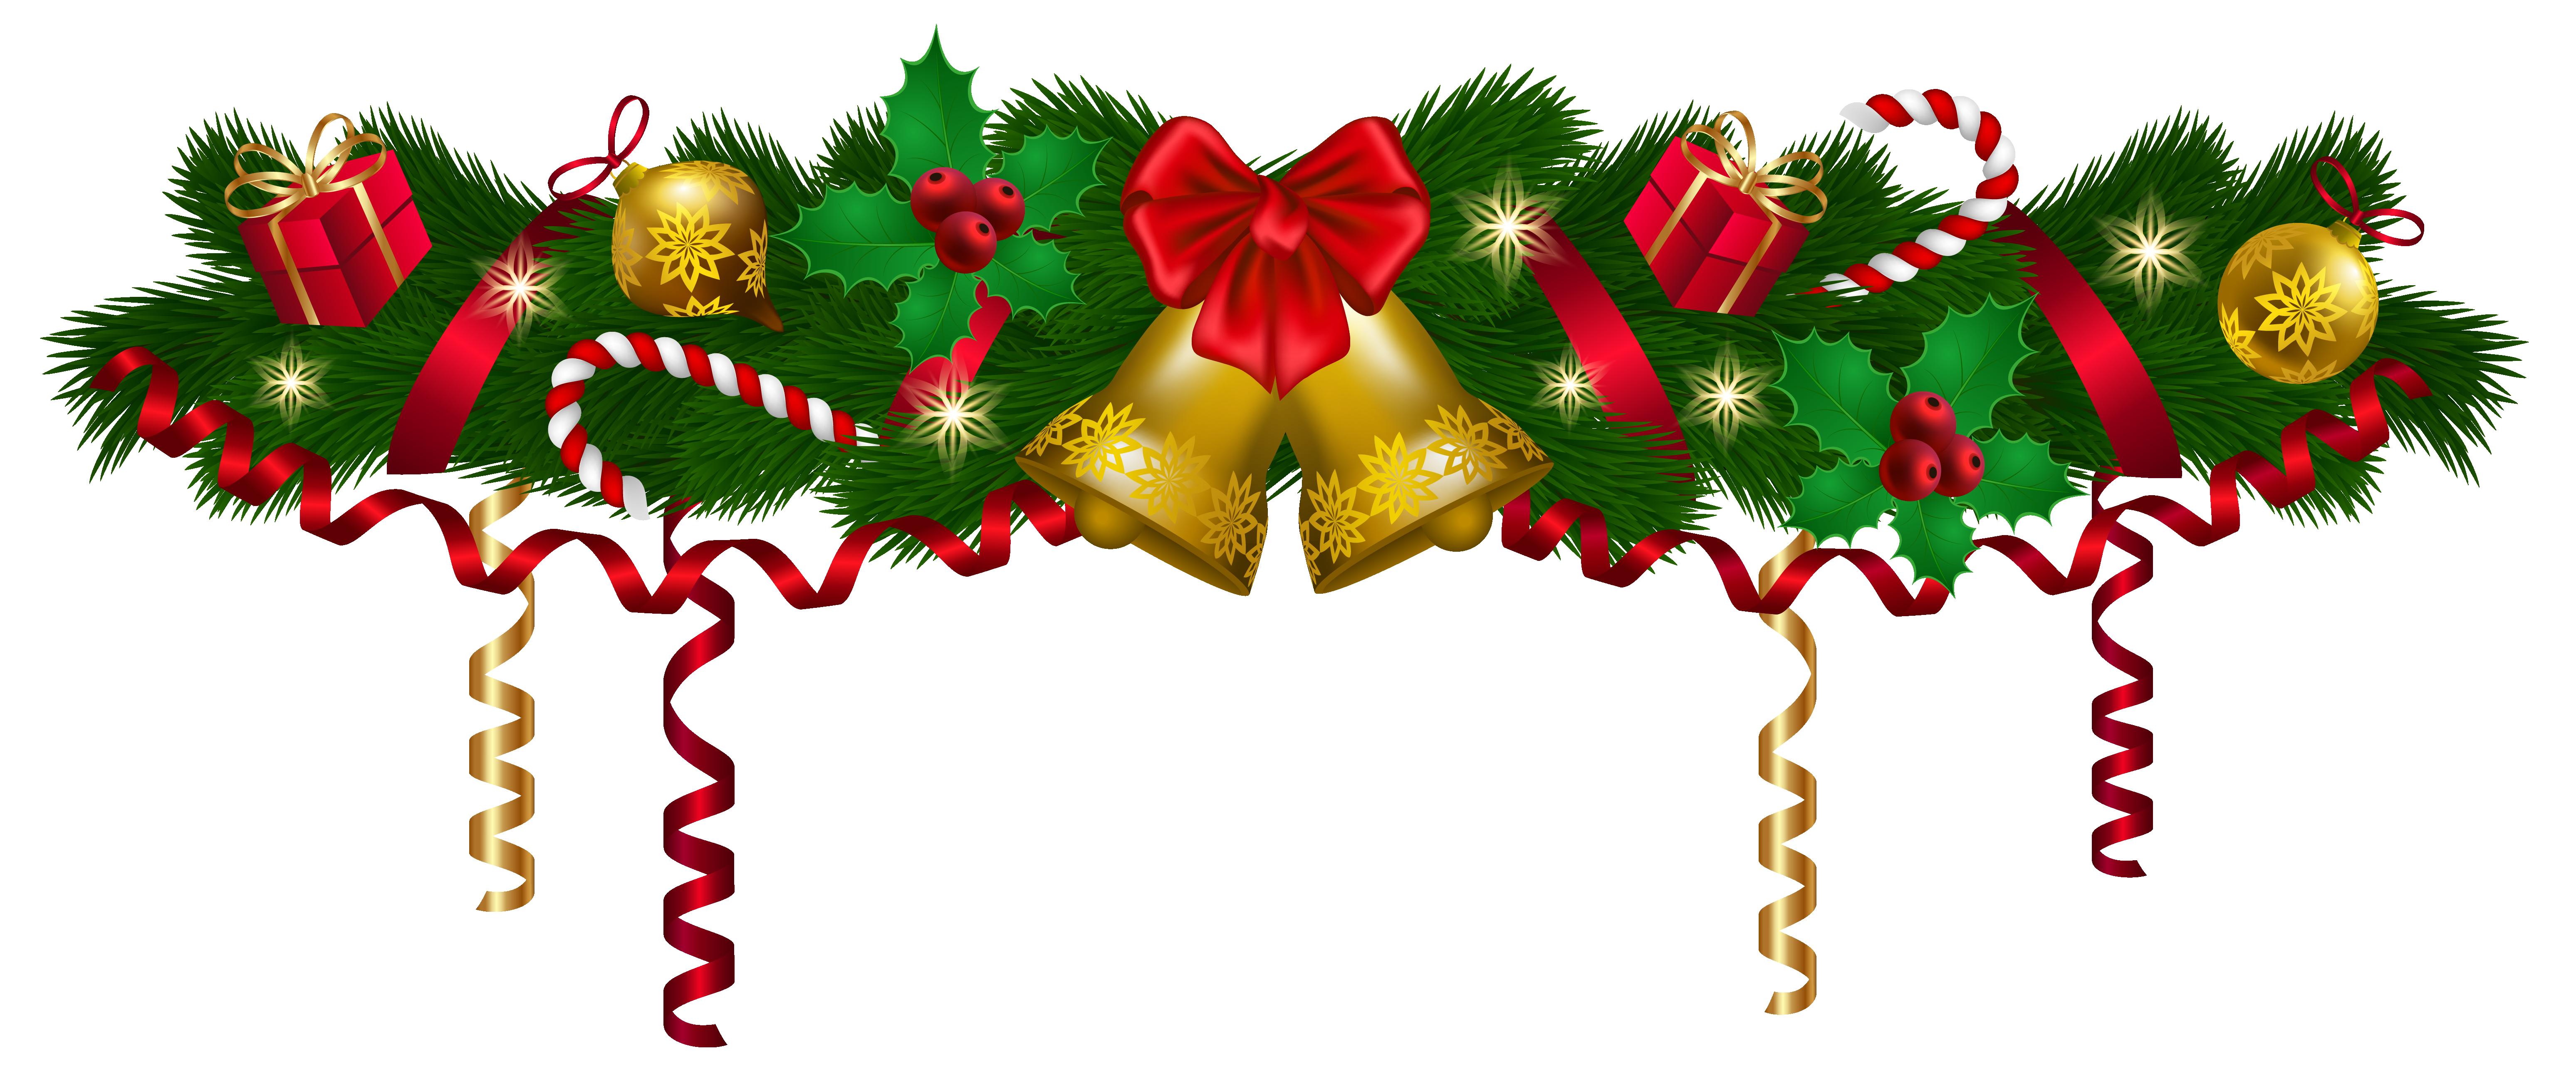 Deco clip art image. Christmas garland border png